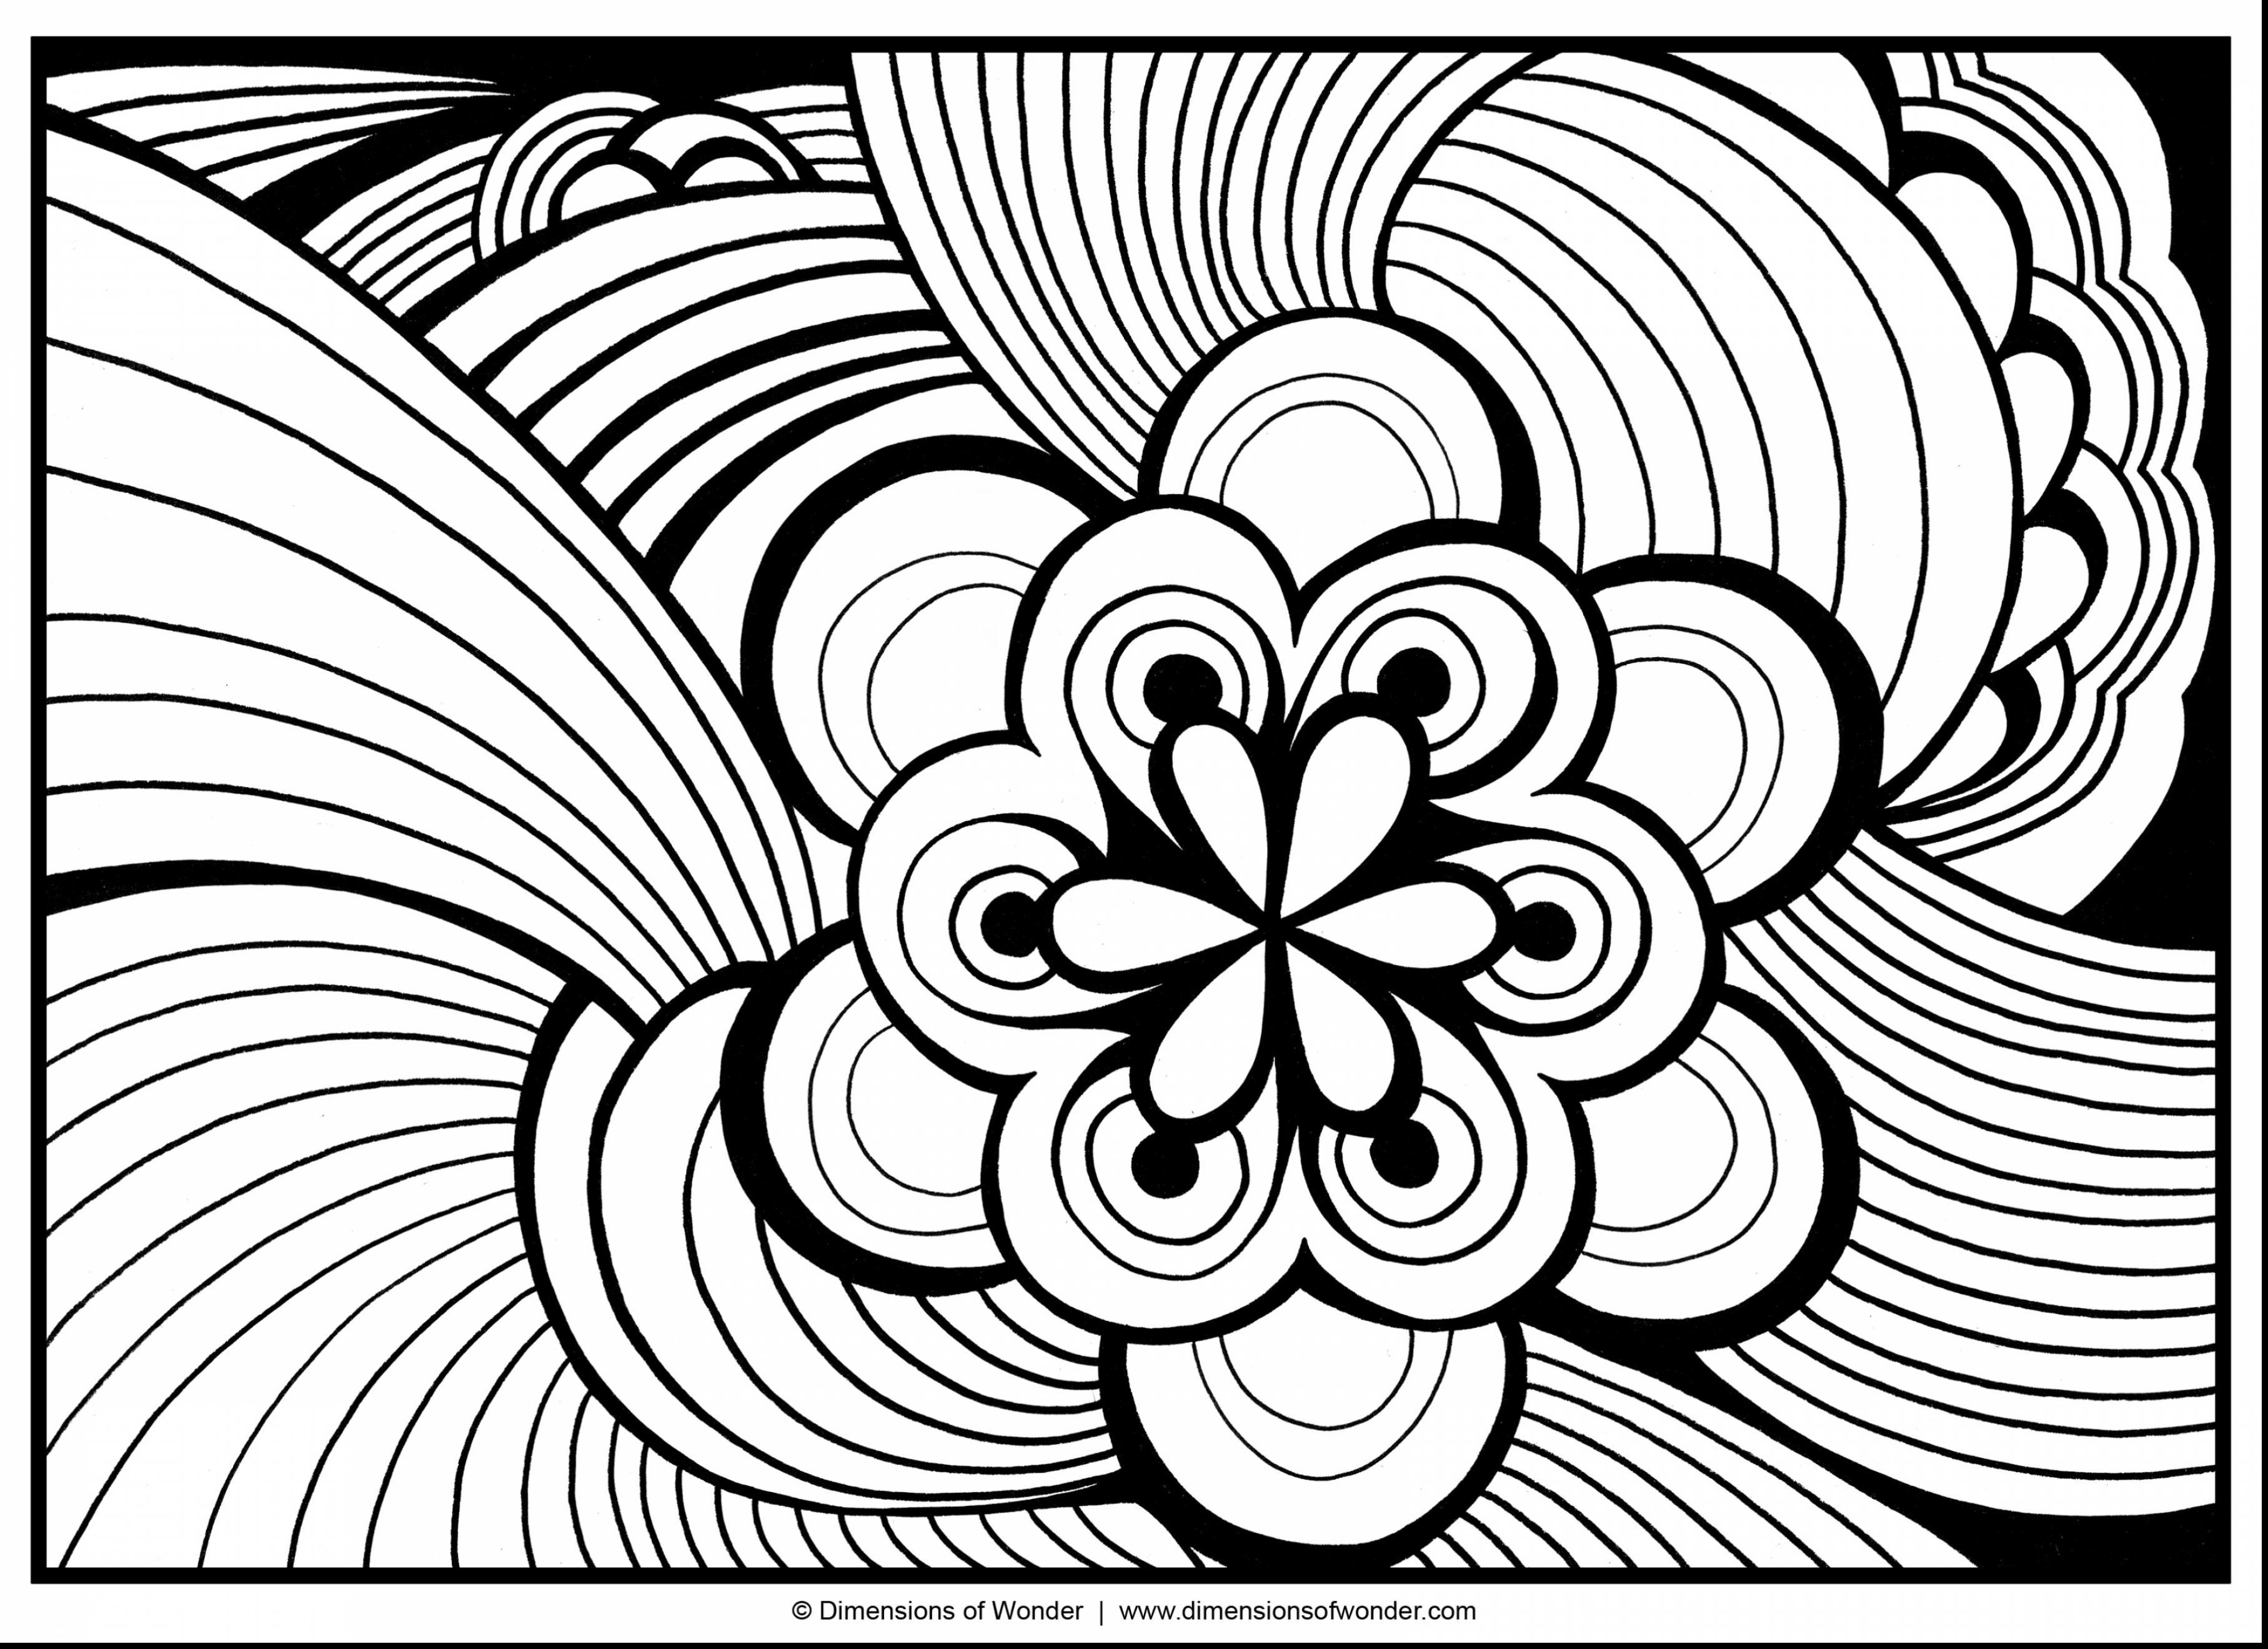 Mandala Drawing Pdf At GetDrawings